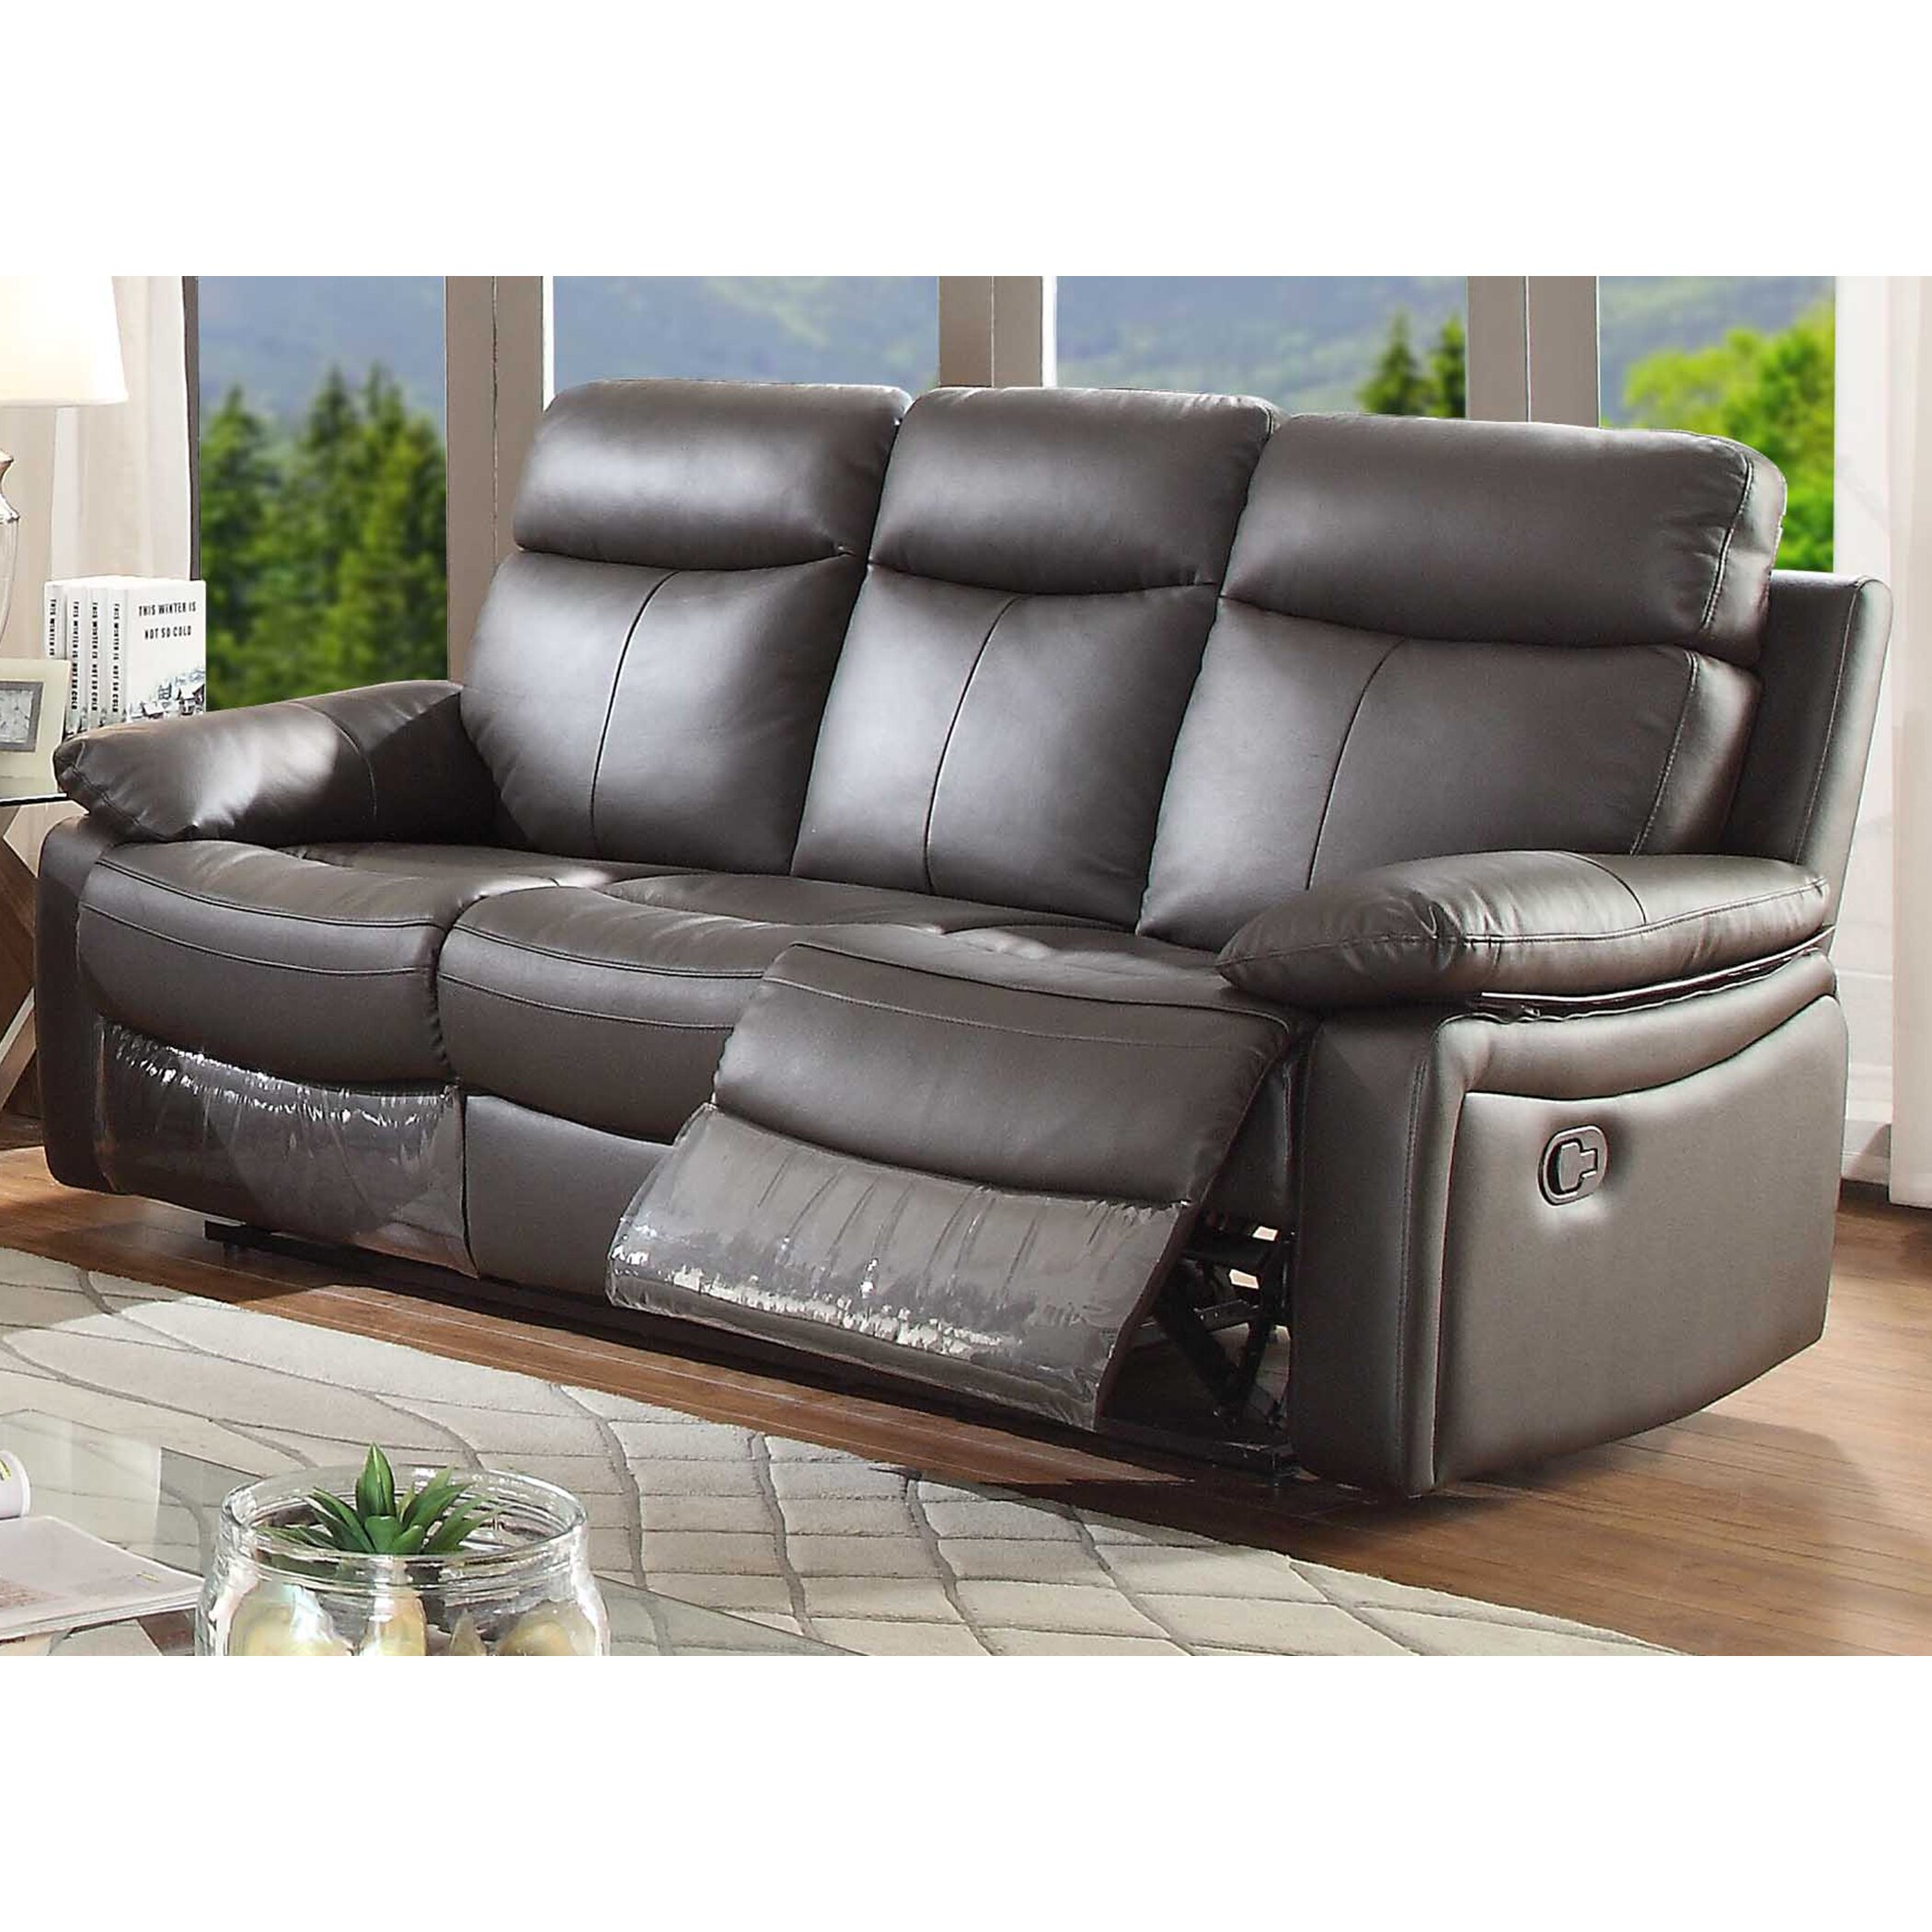 rent a center sofa sleeper bedroom sets